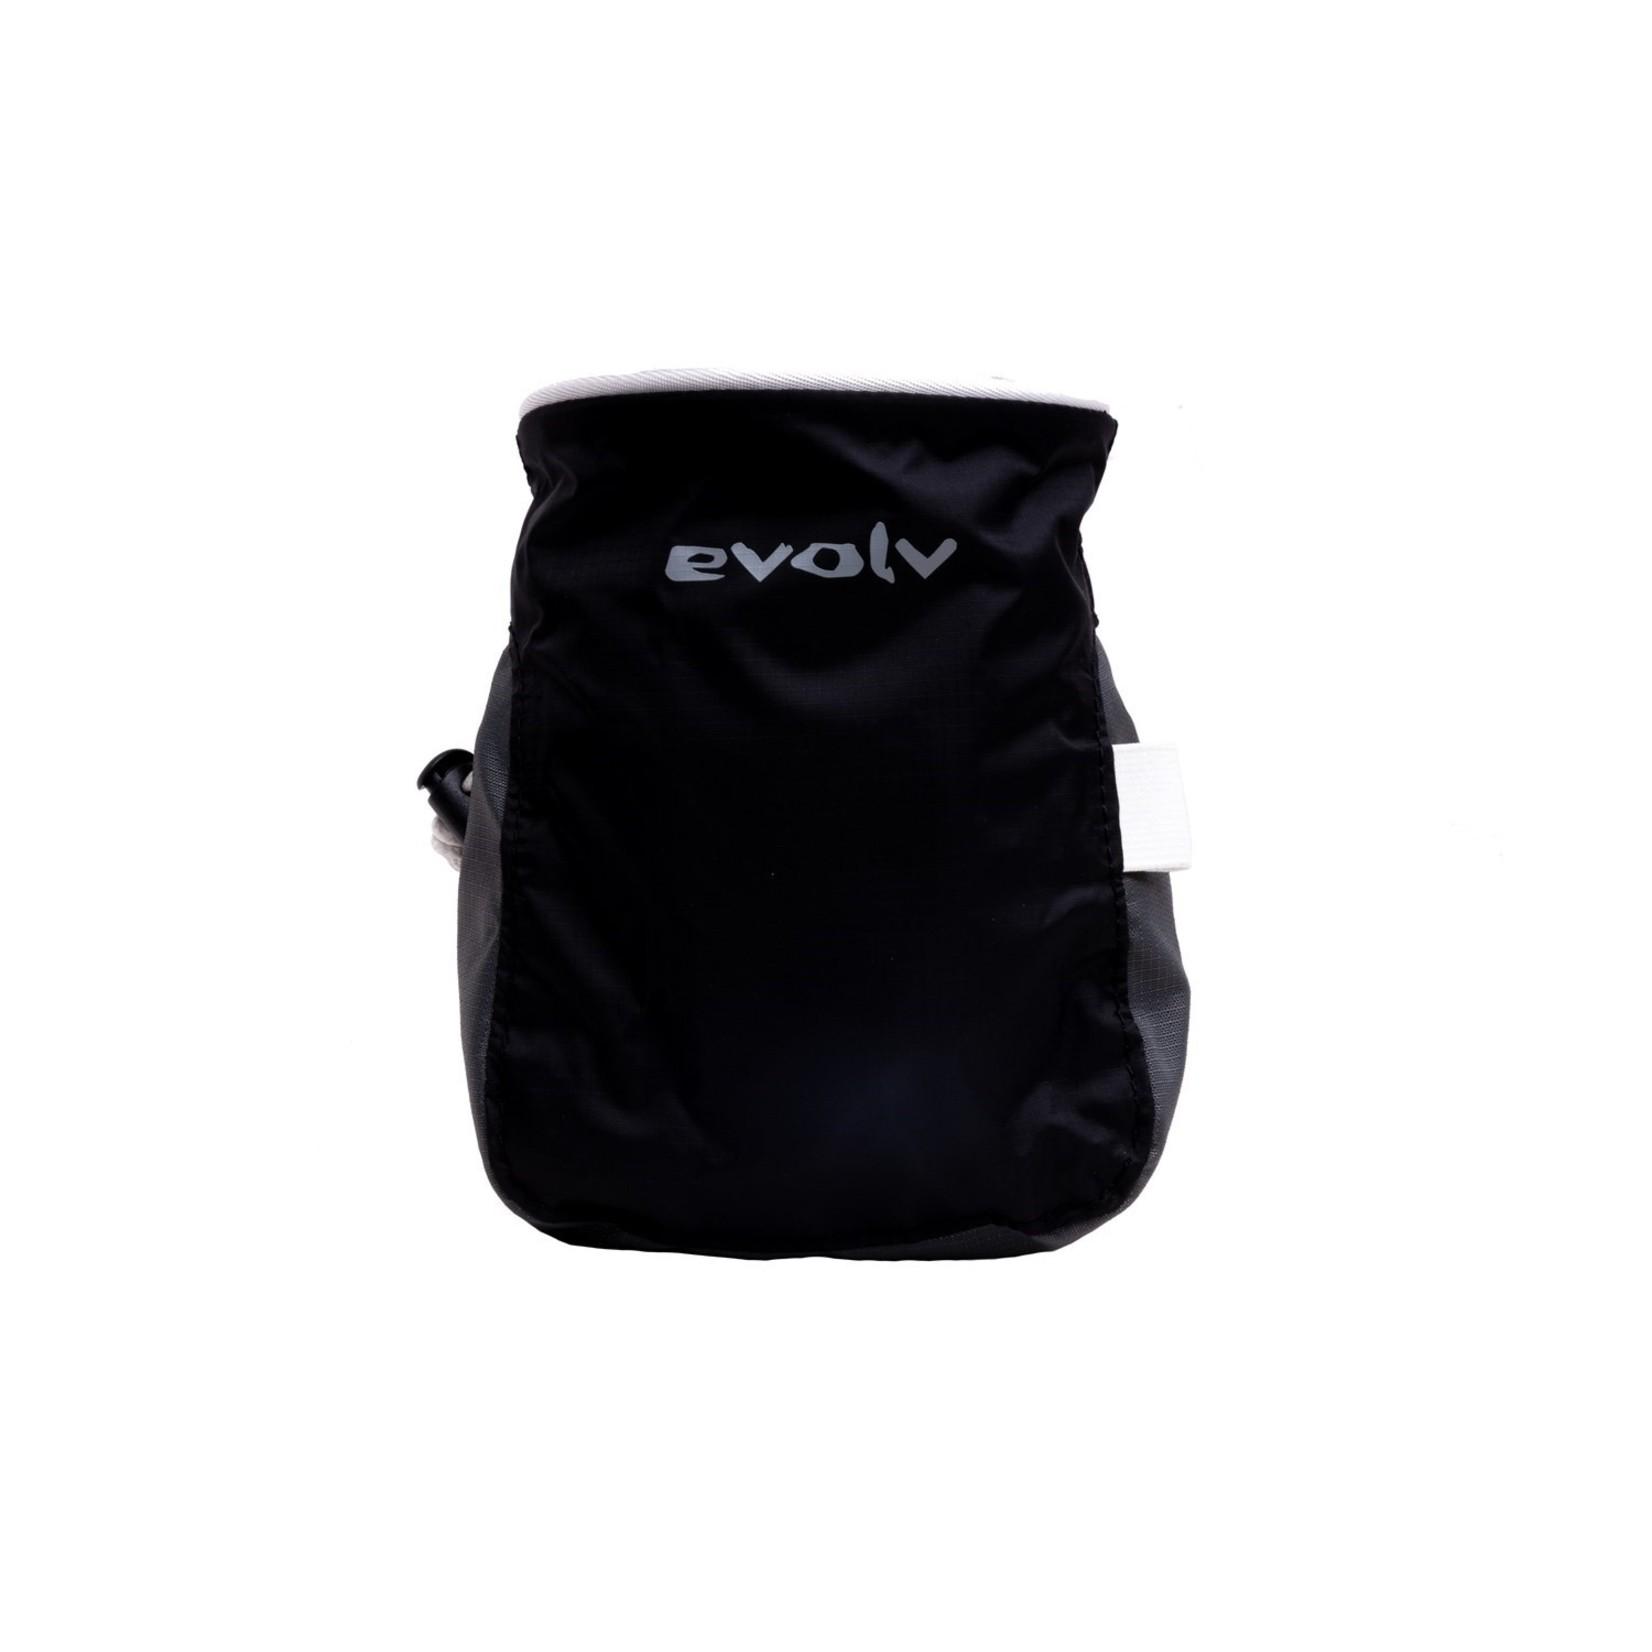 Evolv Superlight chalk bag